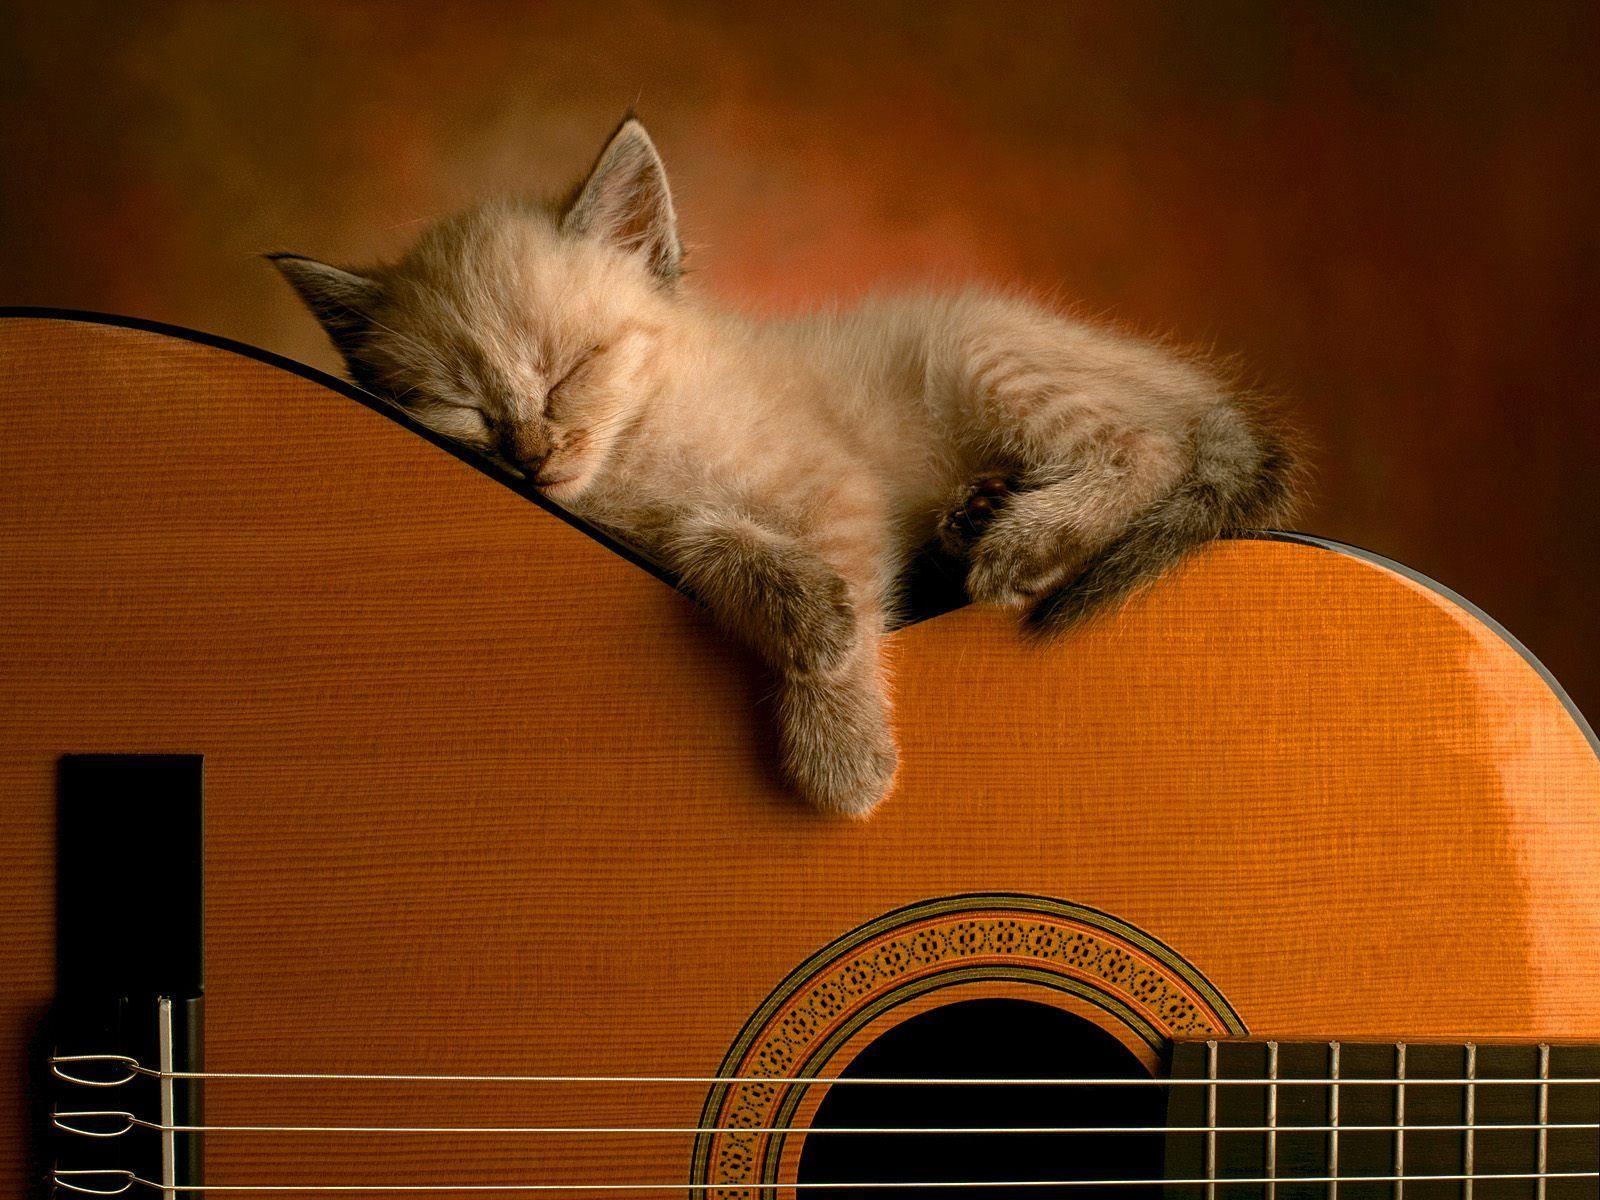 Cat Sleep On Guitar Wallpaper Sleeping Kitten Funny Cat Wallpaper Kittens Cutest